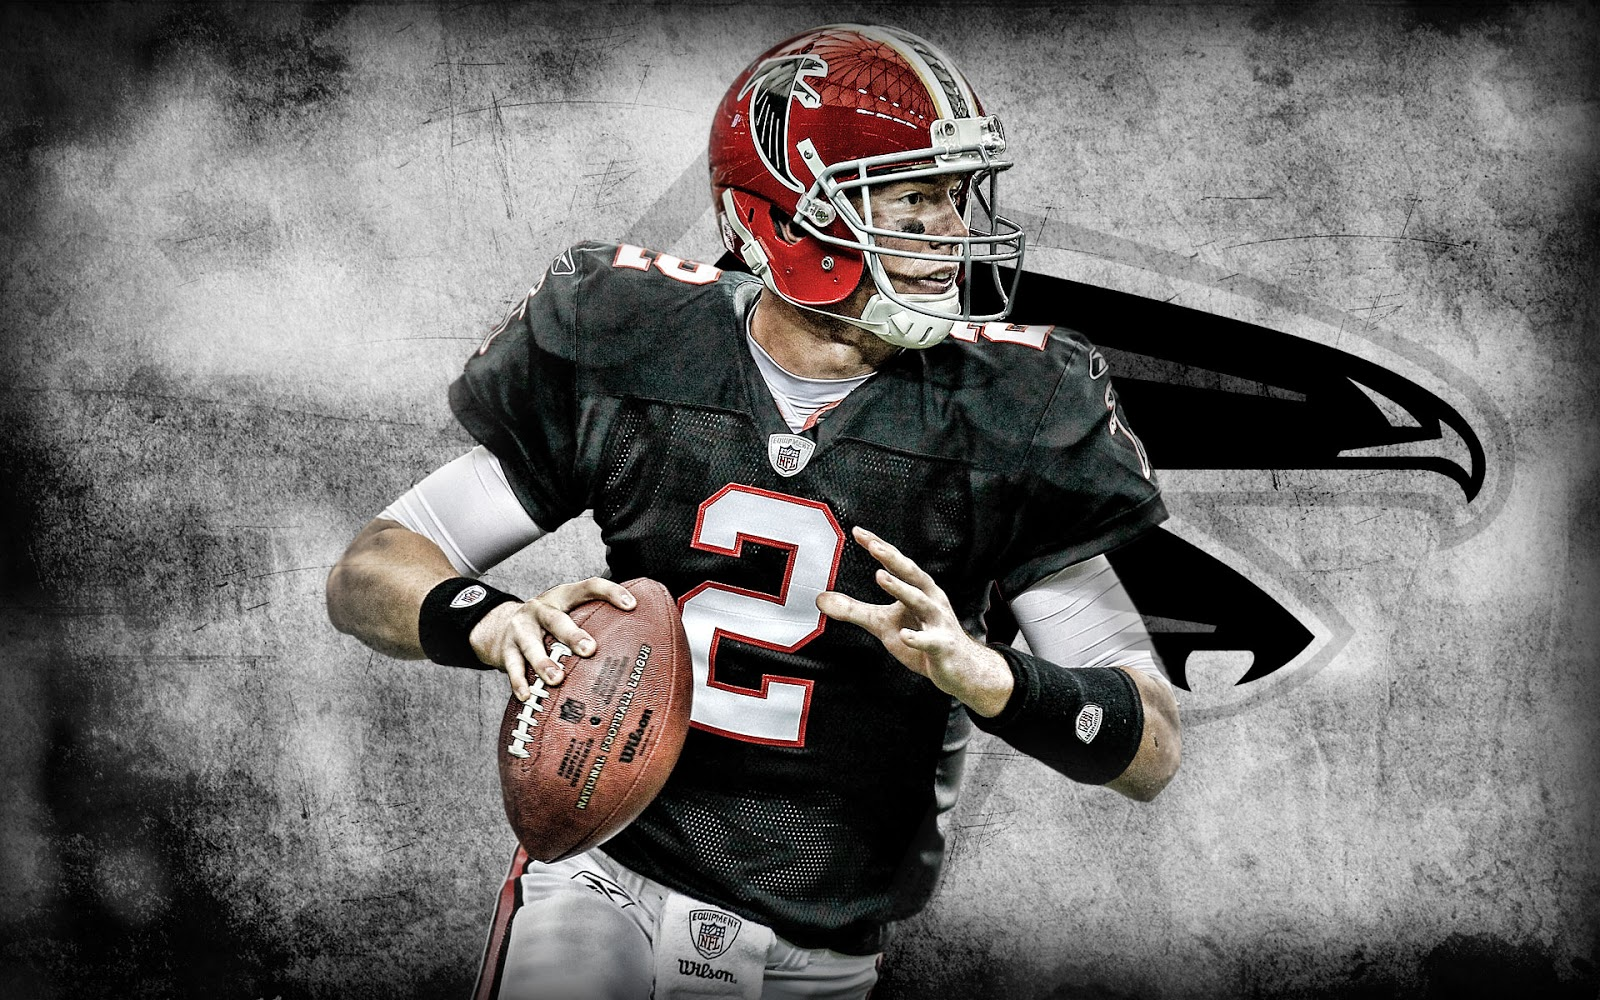 Atlanta Falcons HD Wallpapers - WallpaperSafari